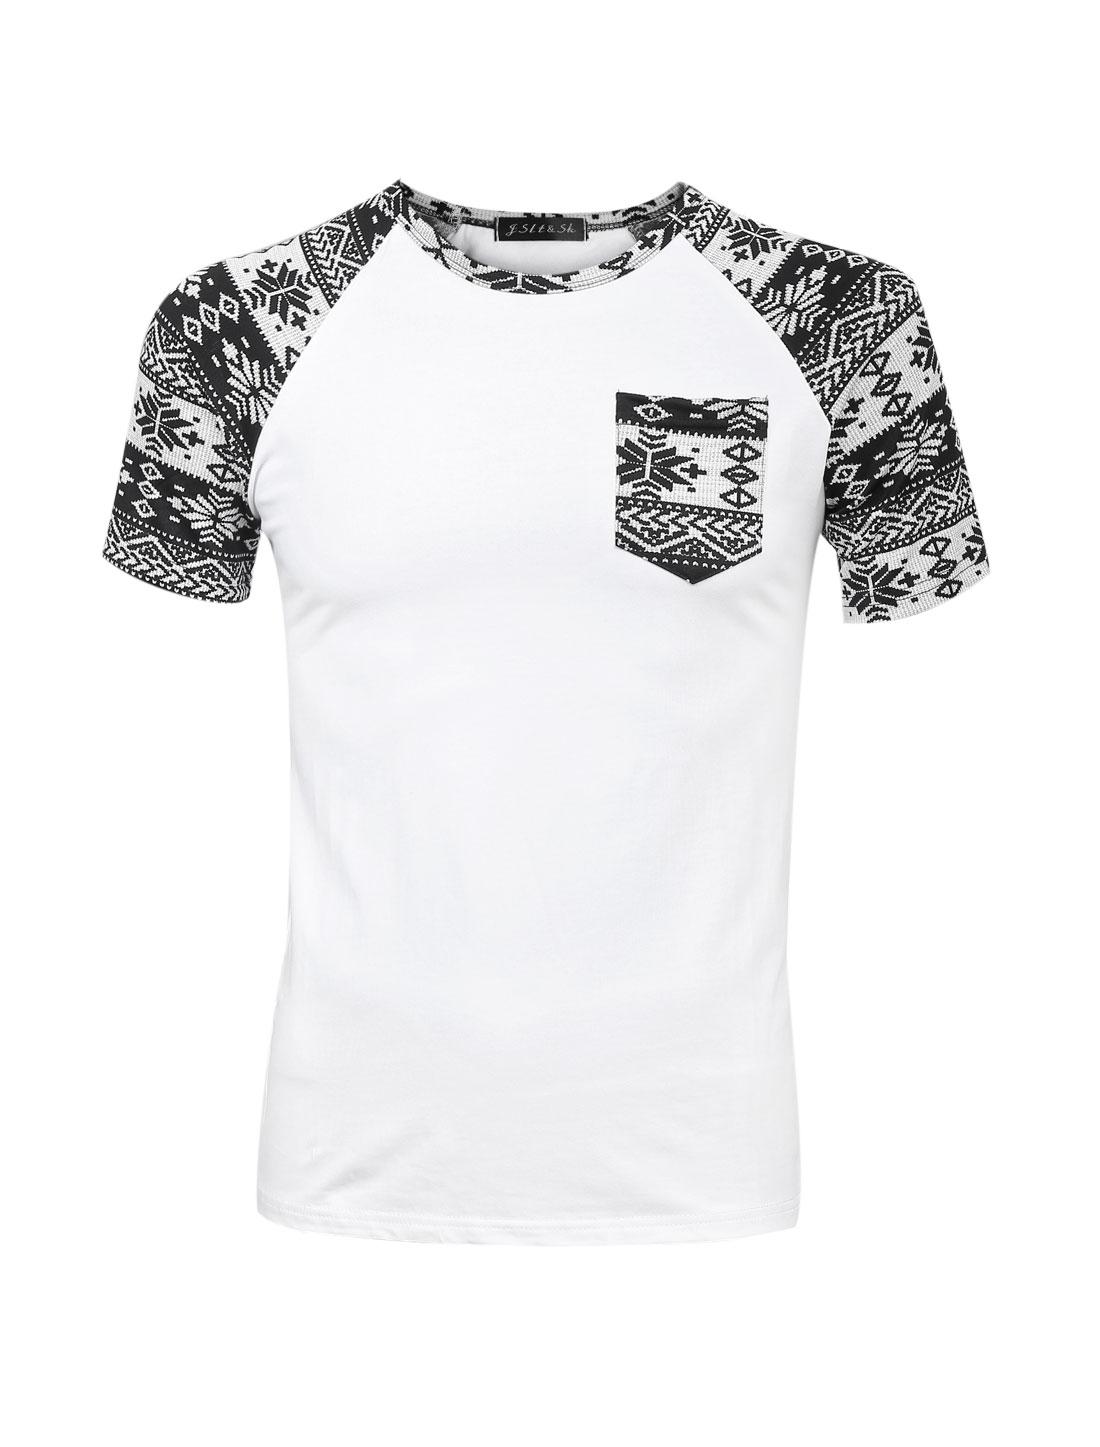 Men Snowflake Prints Patchwork Design Slim Fit T-Shirt White S